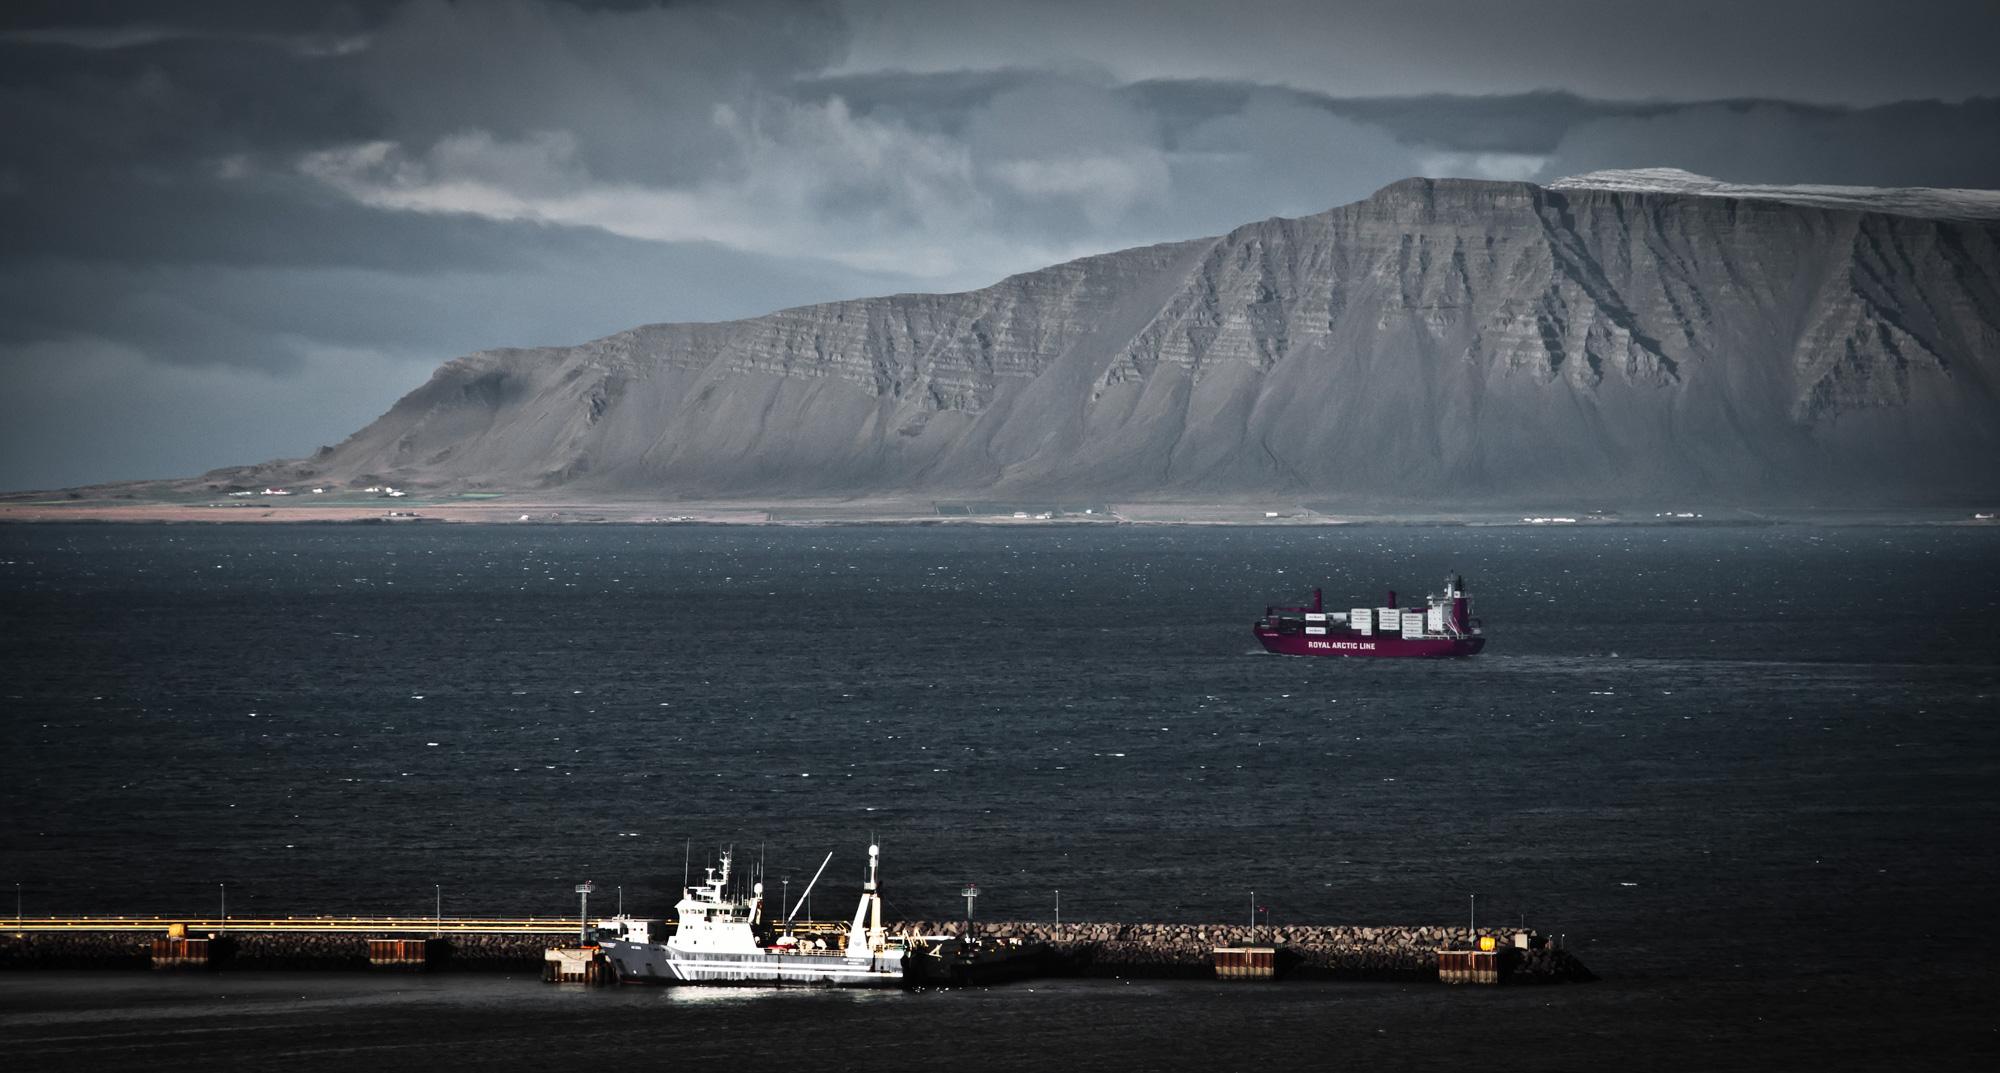 planx-iceland-fotoreportage-09d